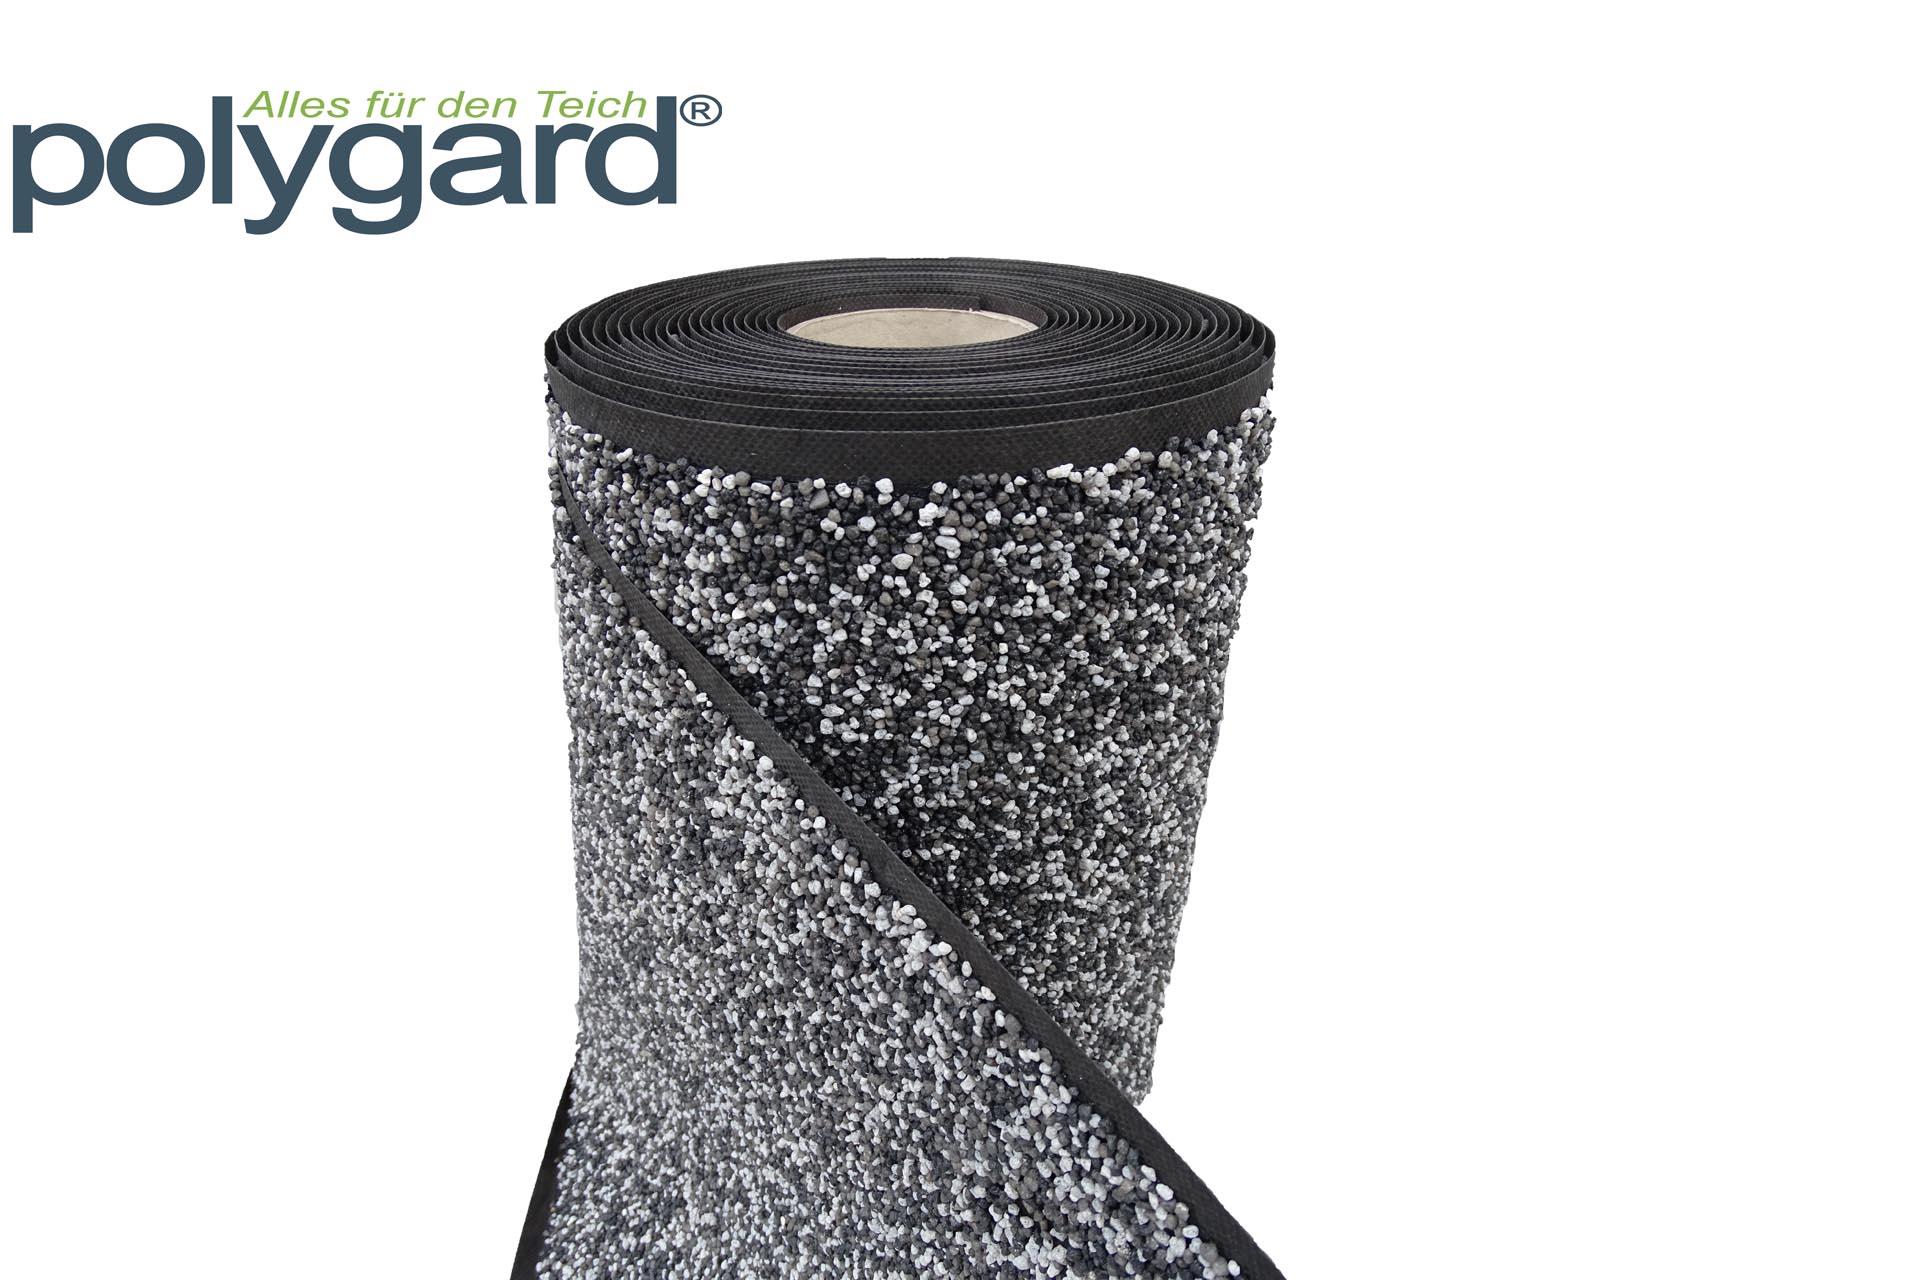 Steinfolie - Polygard - Granitgrau